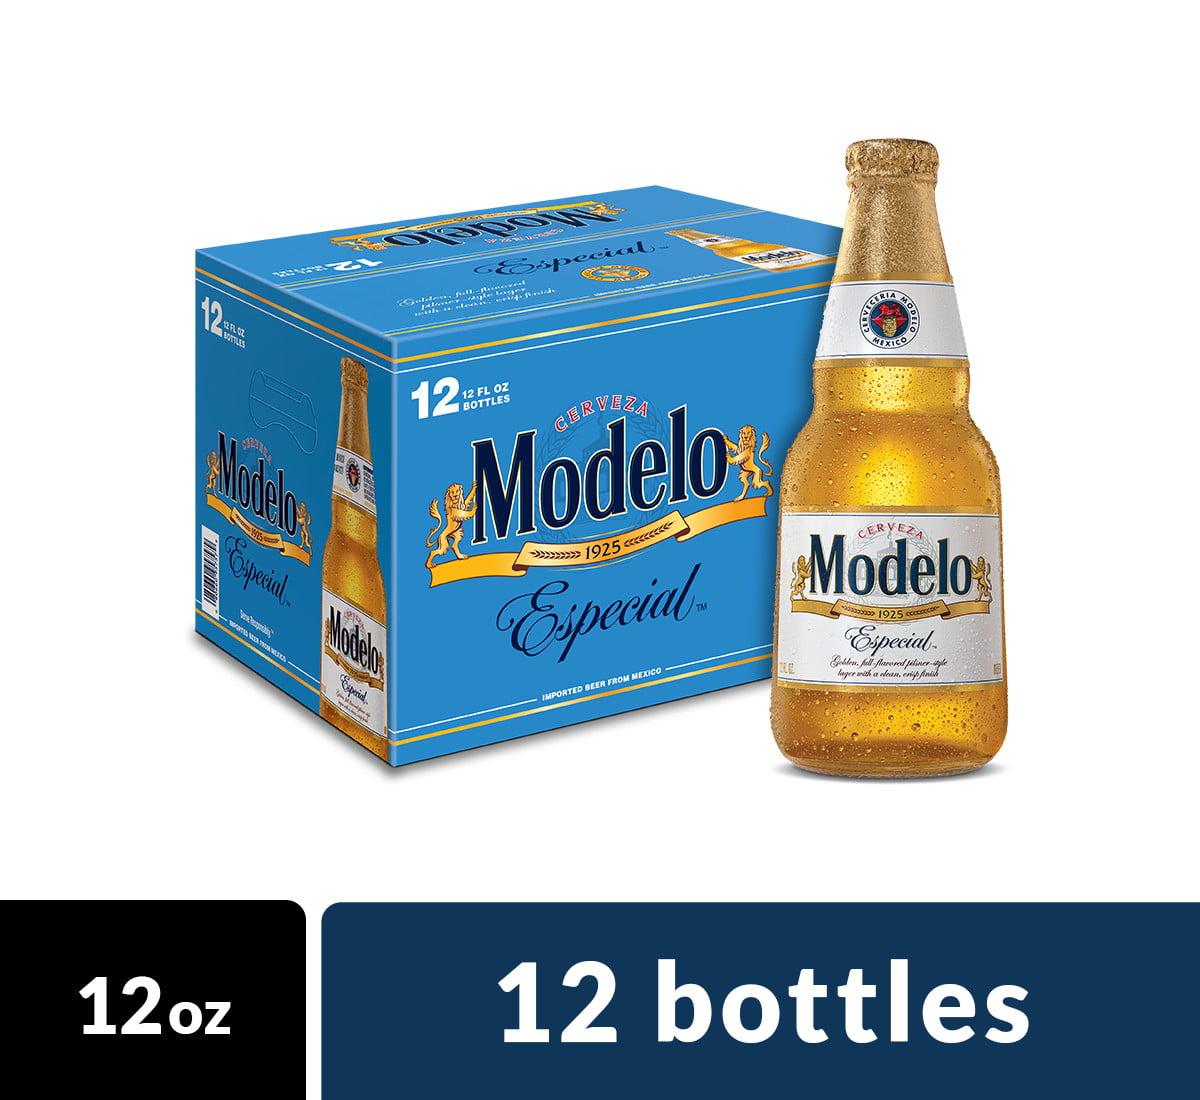 Modelo Especial Import Beer, 12 pk 12 fl oz Bottles, 4.4% ABV